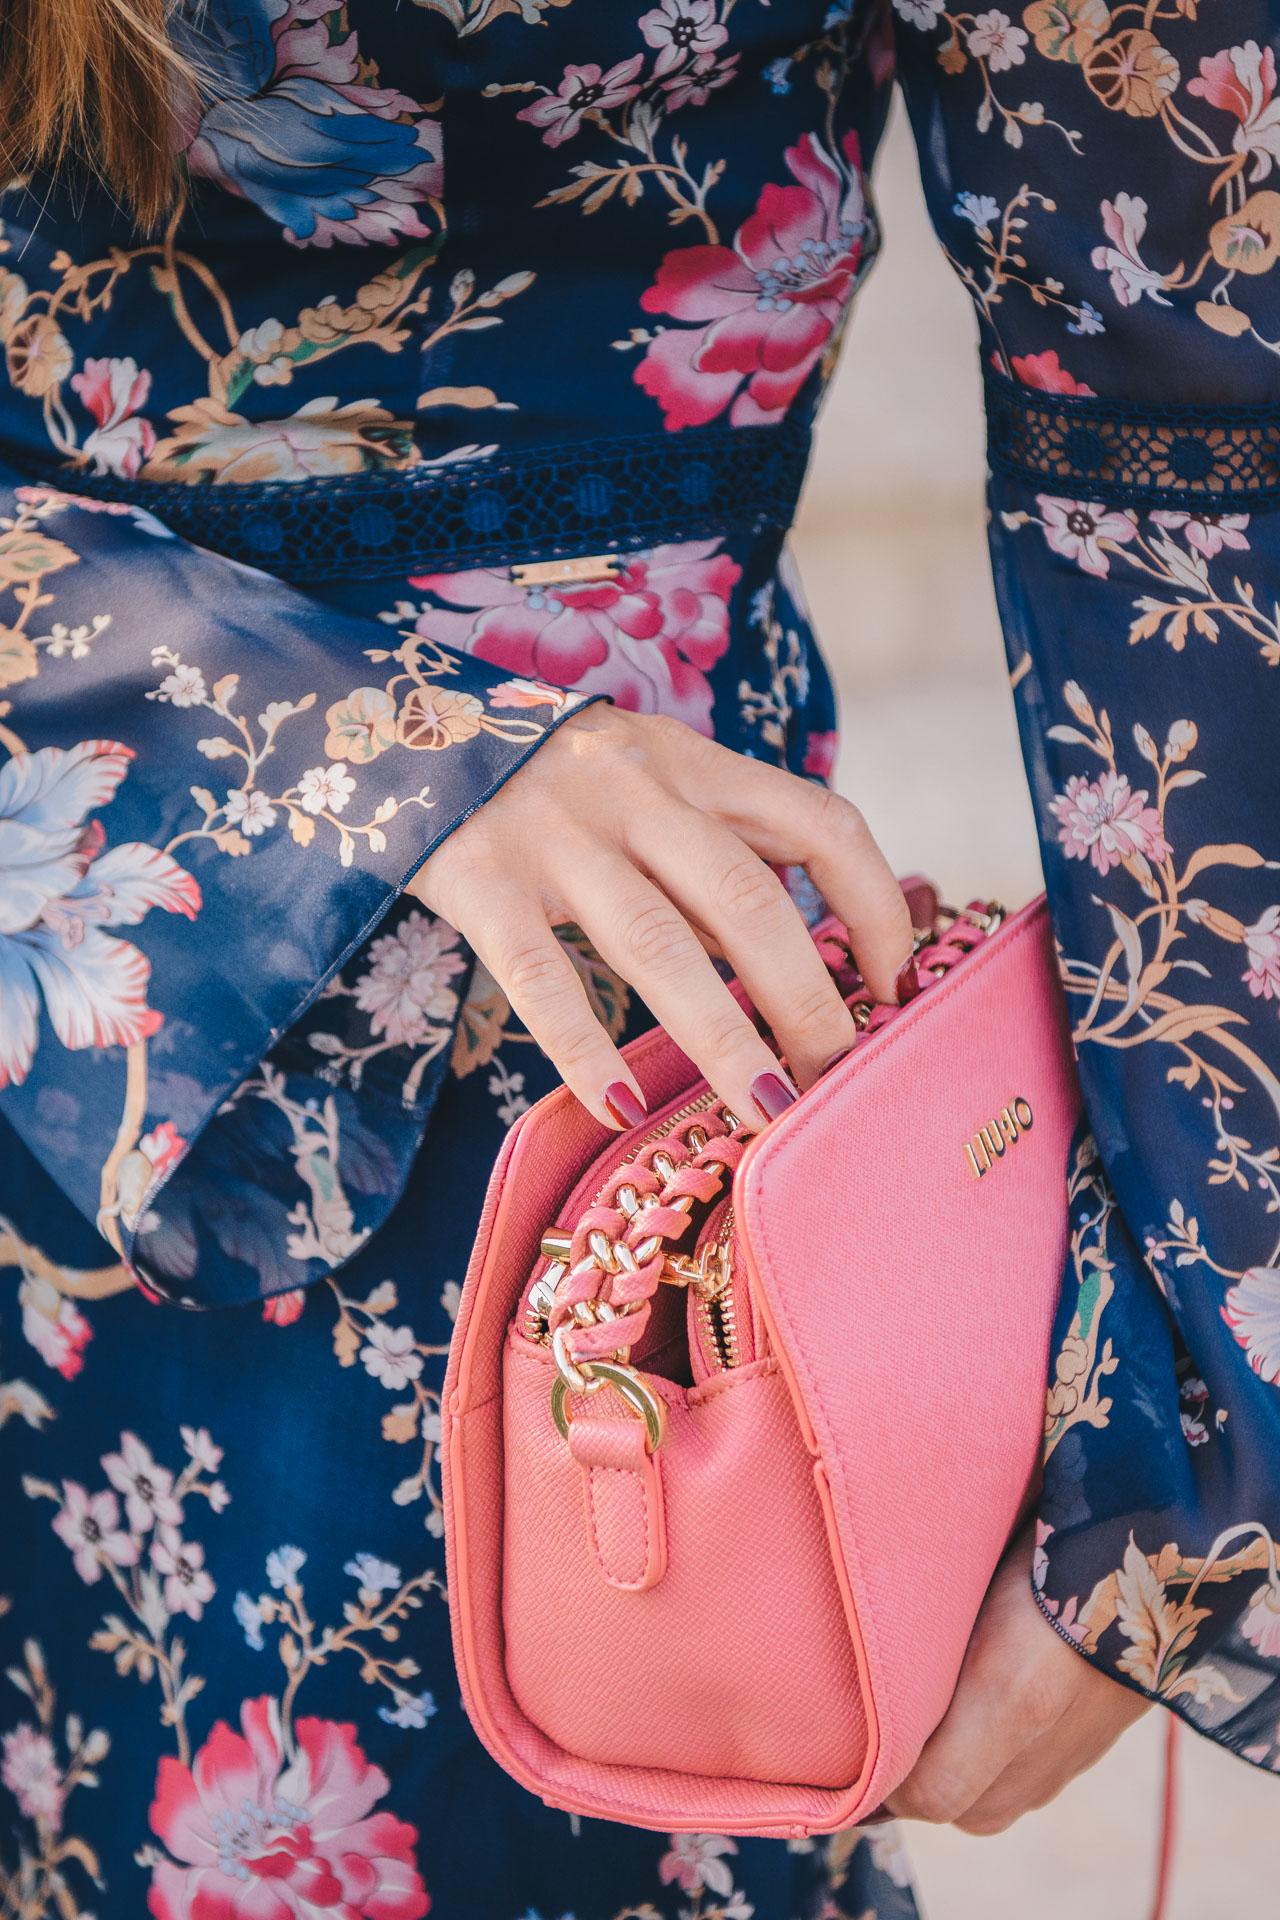 2017 Liu Jo pink handbag